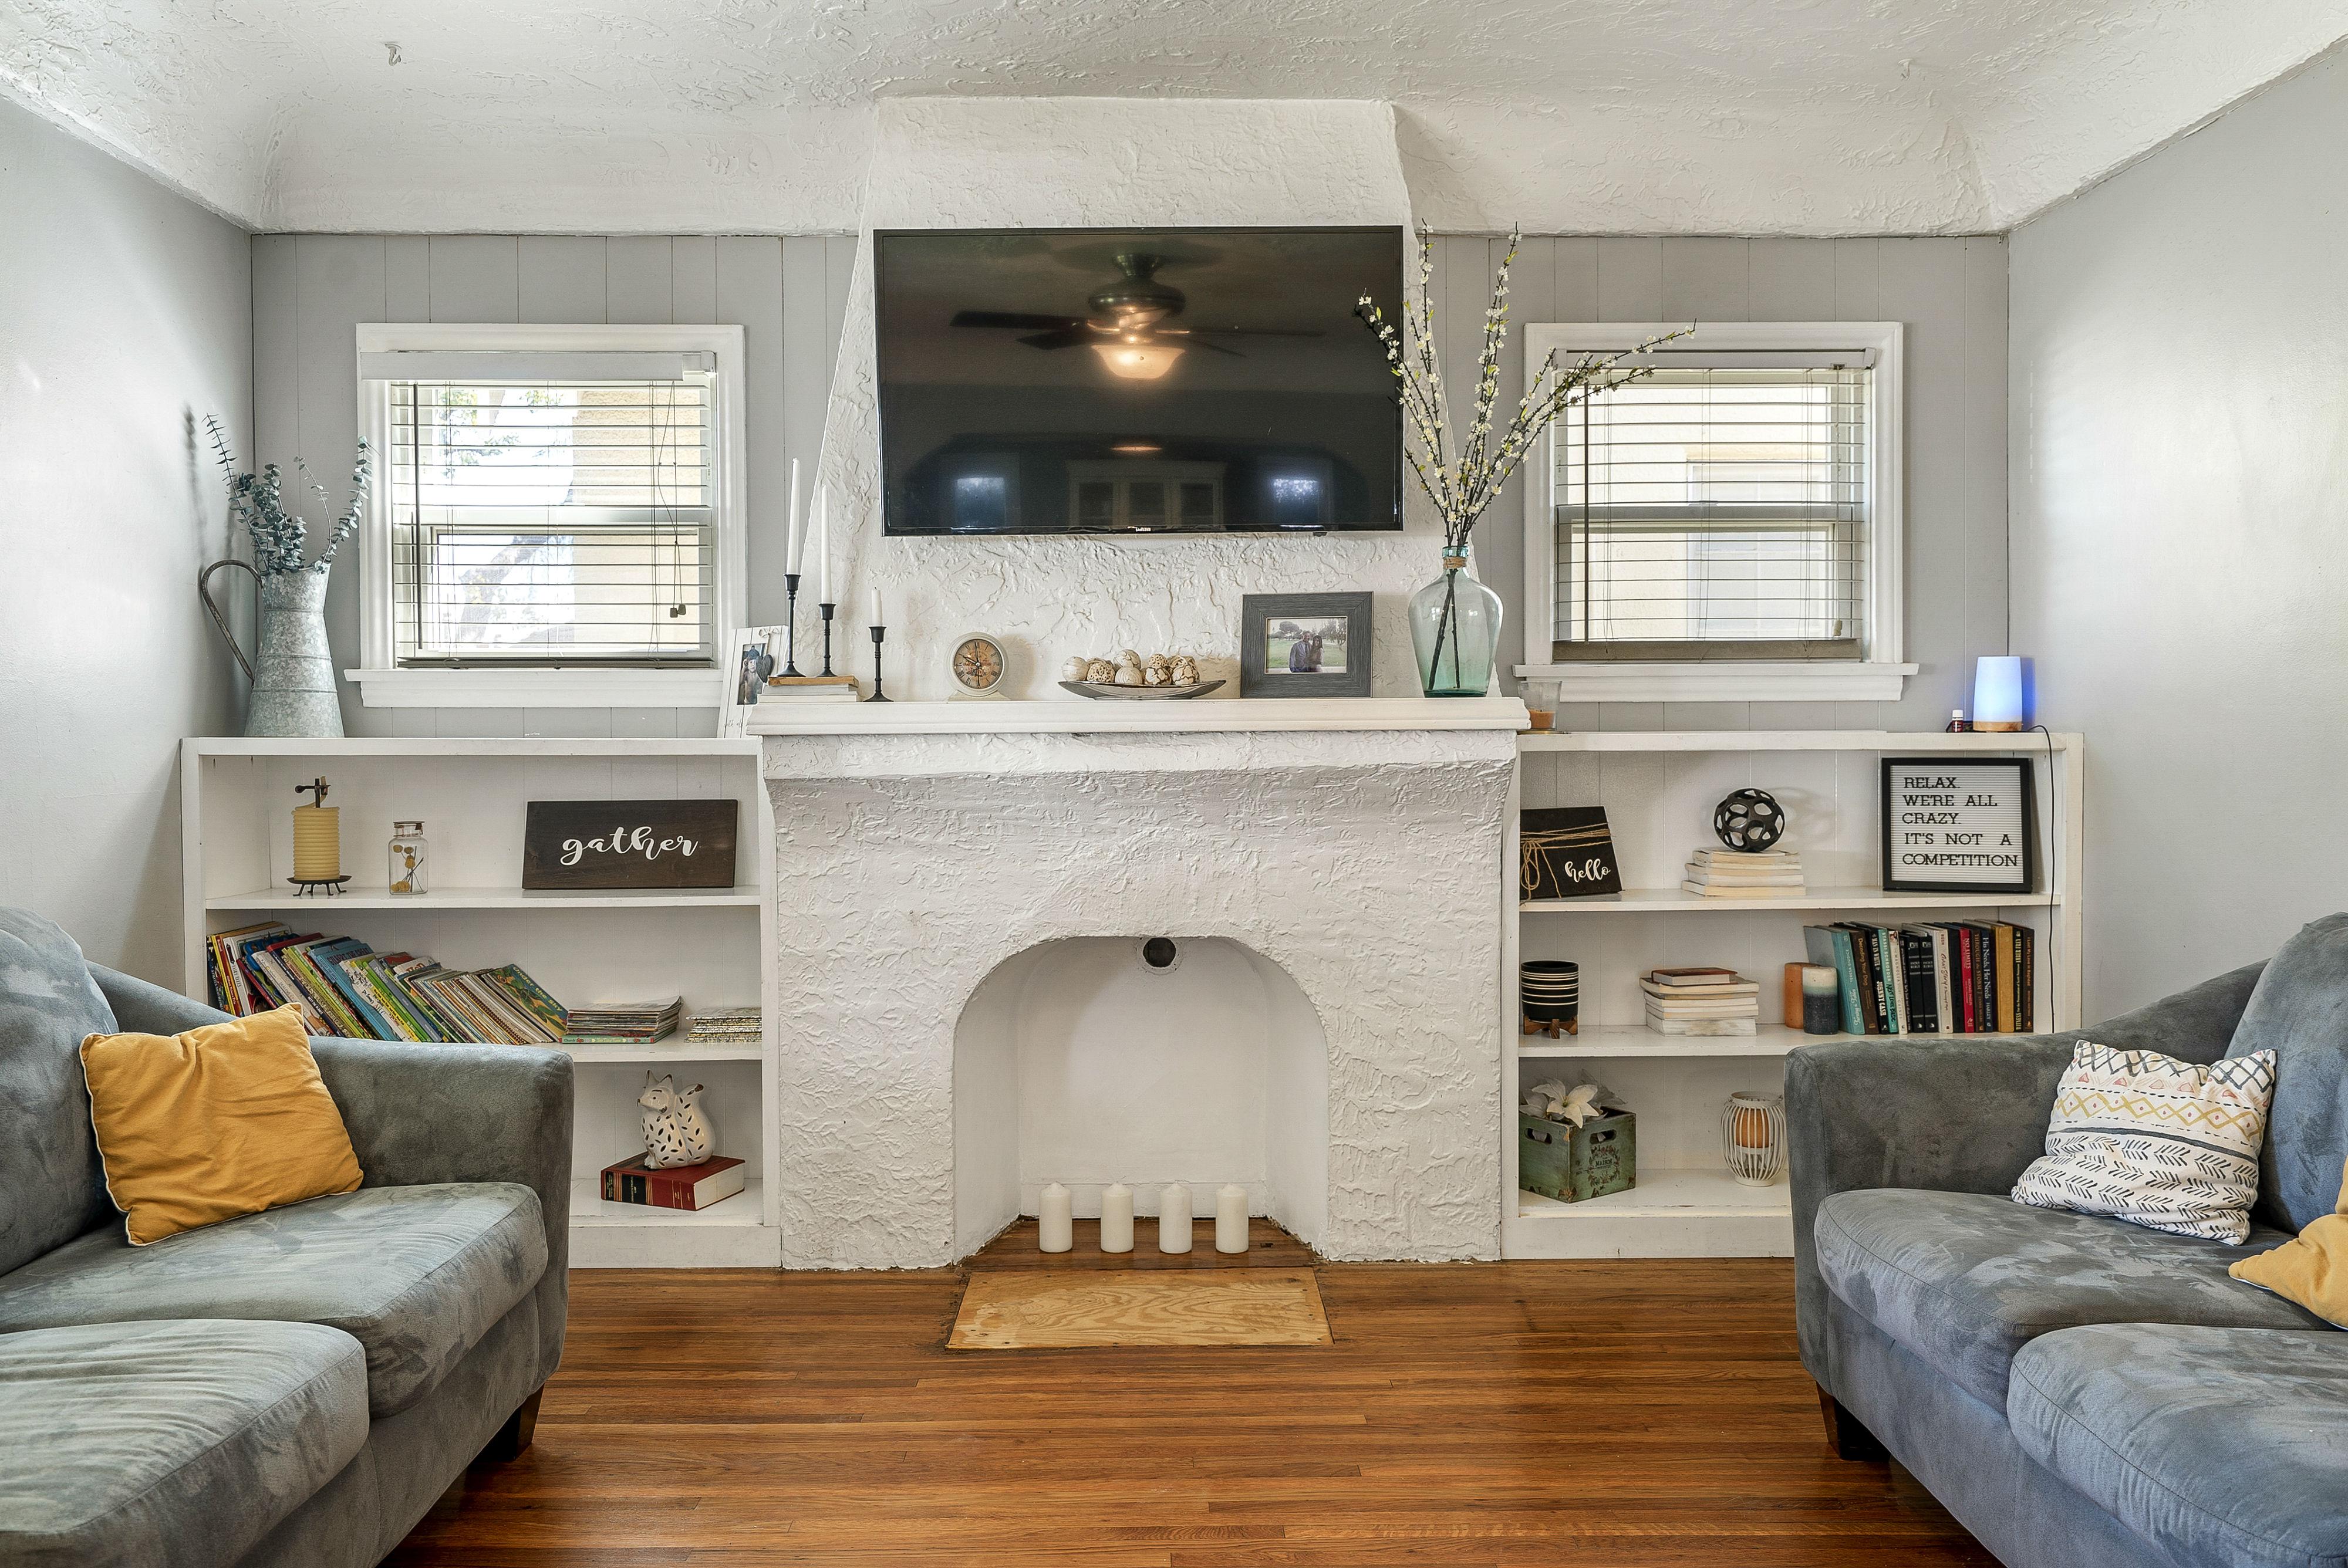 Custom bookshelves flanking decorative romantic fireplace.